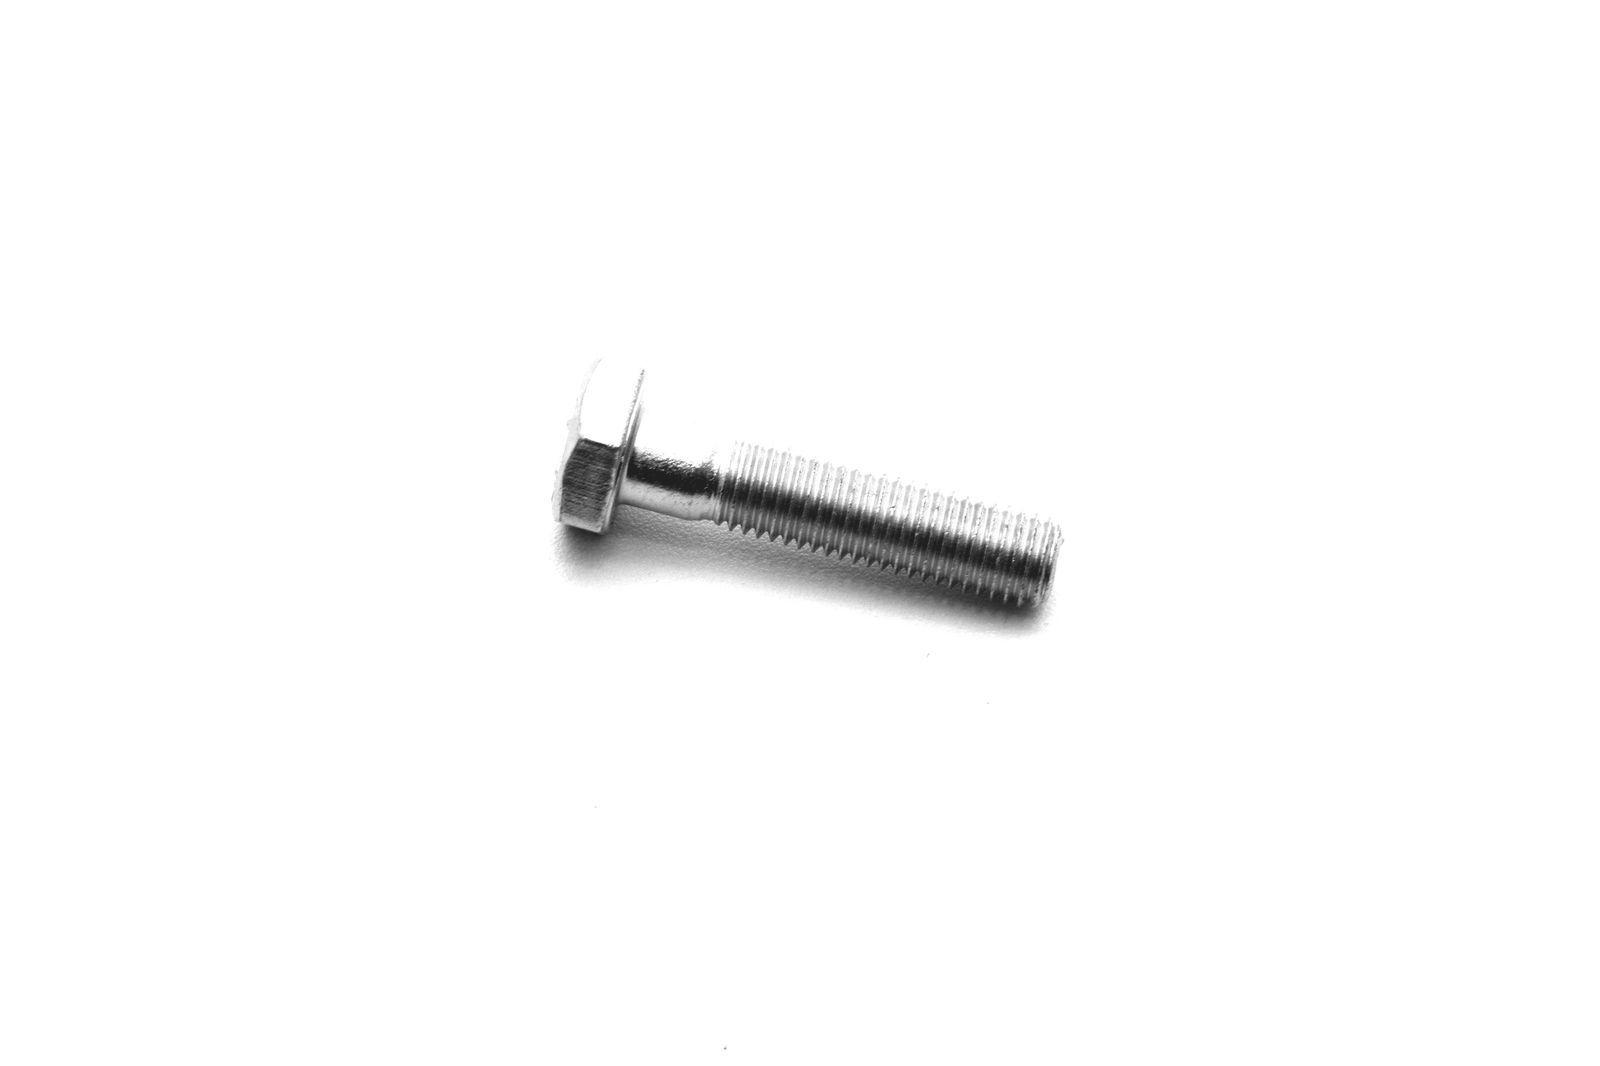 "#1002-01 Bolzen UNF 1/4"" x 1 1/8"" (5x), BH604091|5"